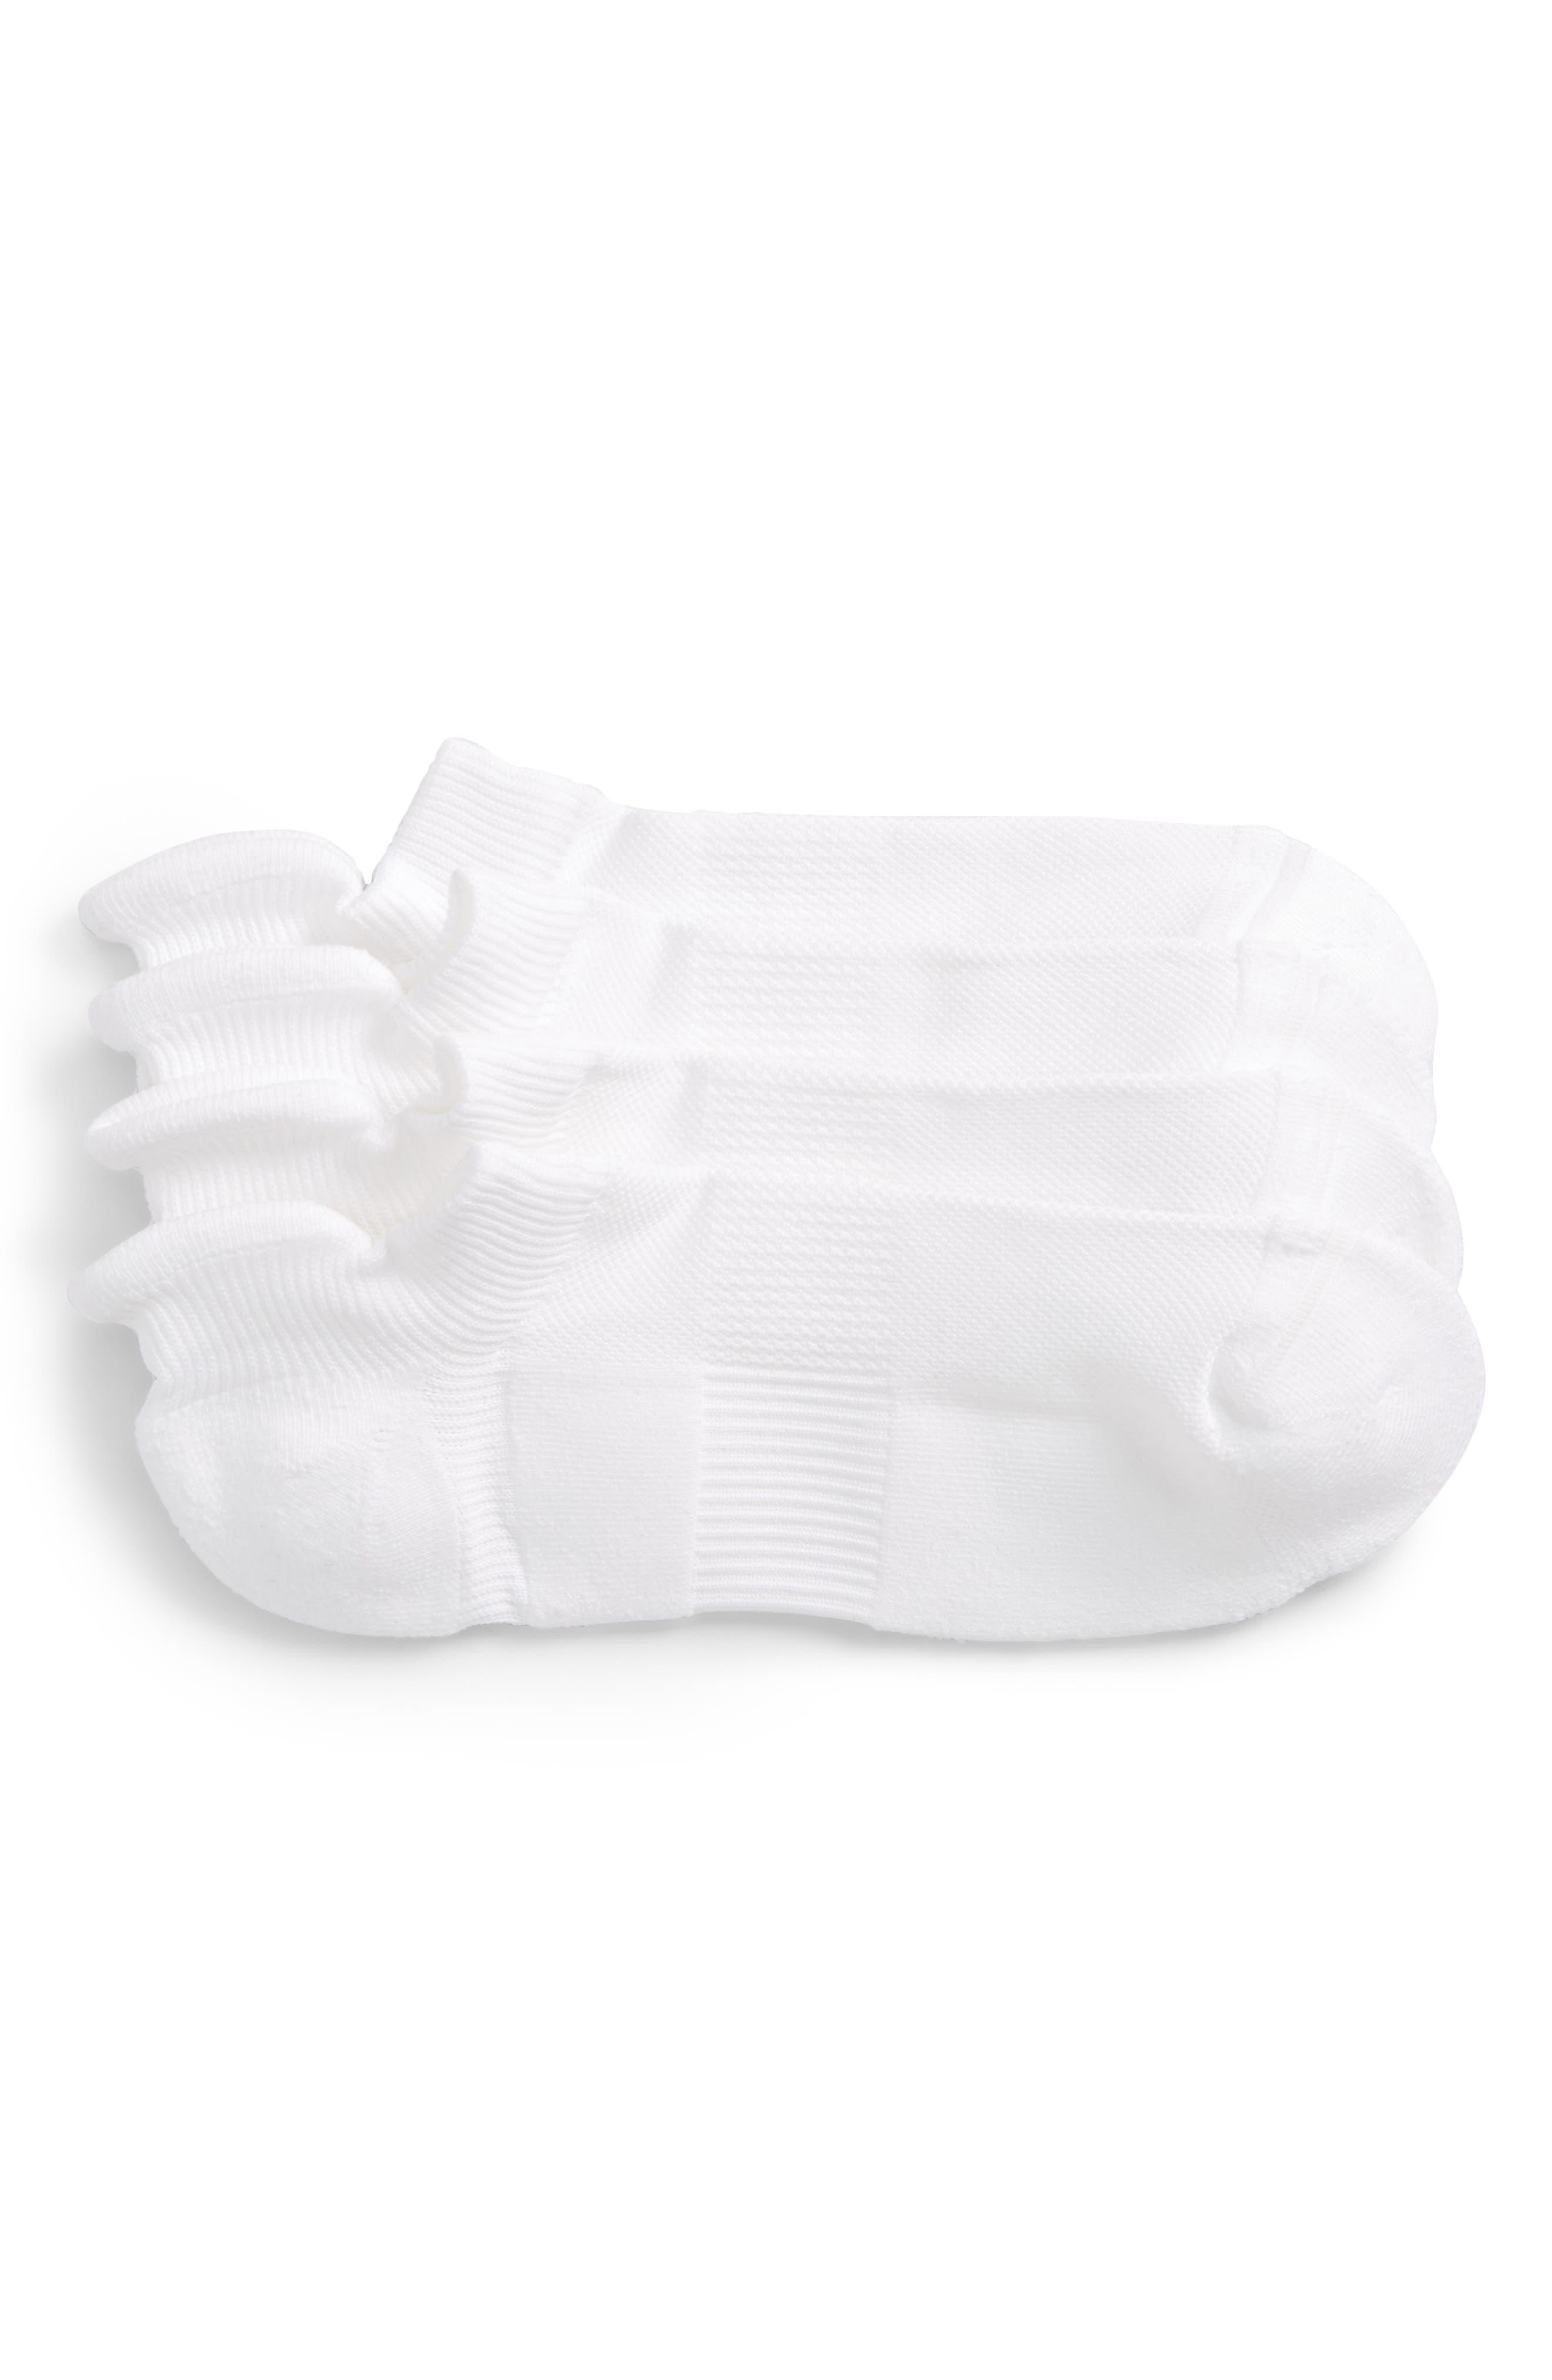 Nordstrom Men's Shop 2-Pack Tech-Smart No-Show Socks